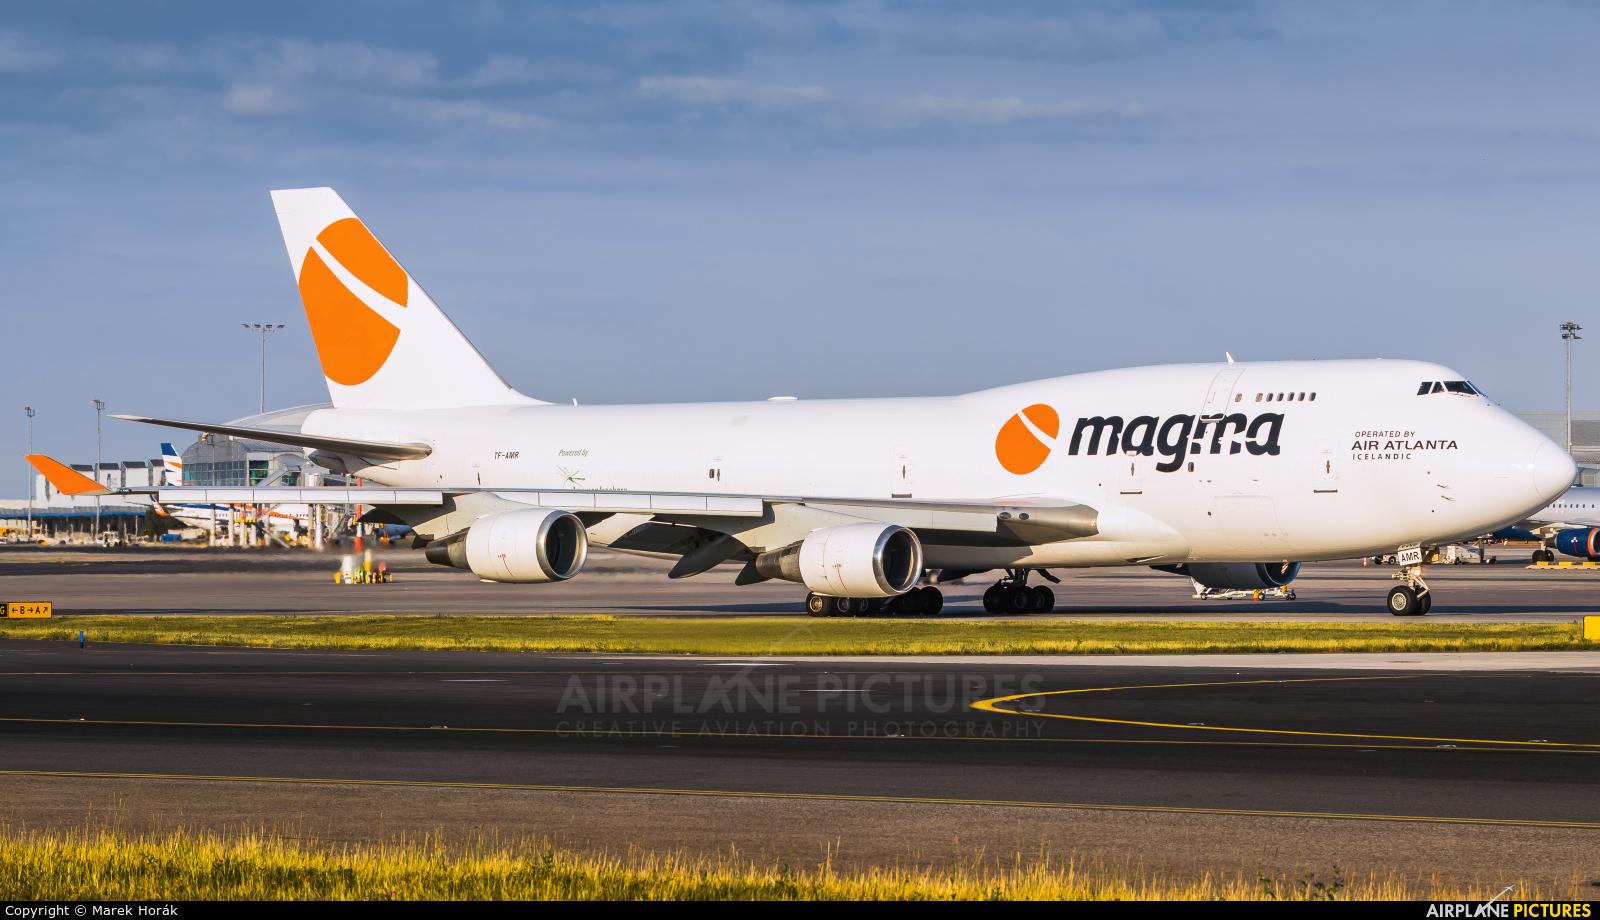 Air Atlanta Icelandic TF-AMR aircraft at Prague - Václav Havel